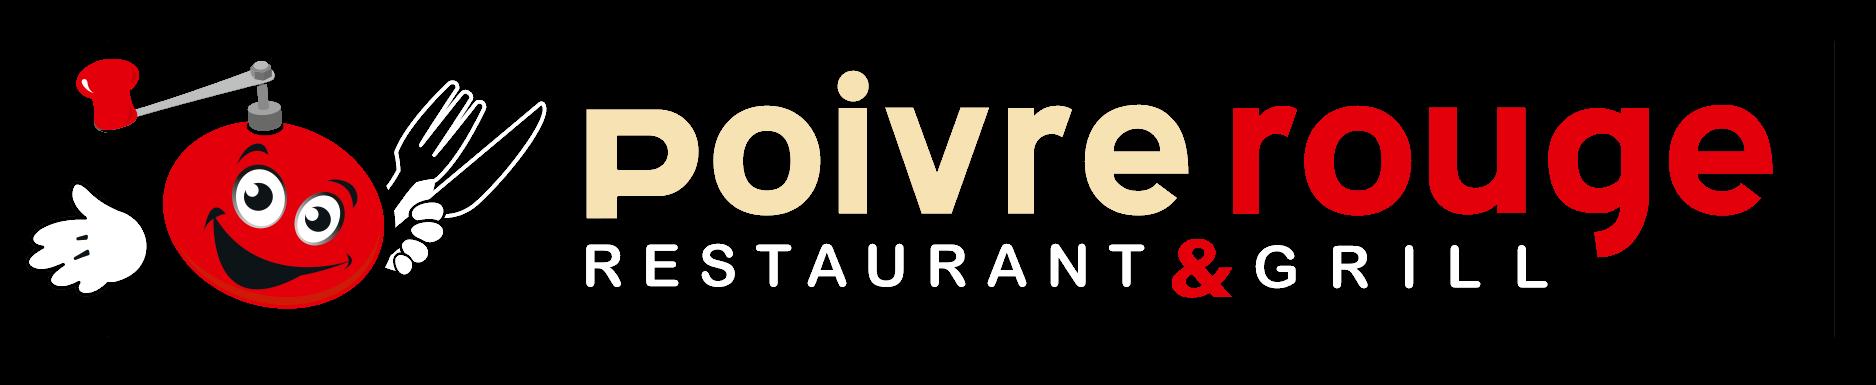 logo_poivre-rouge-horizontal_rvb_detoure